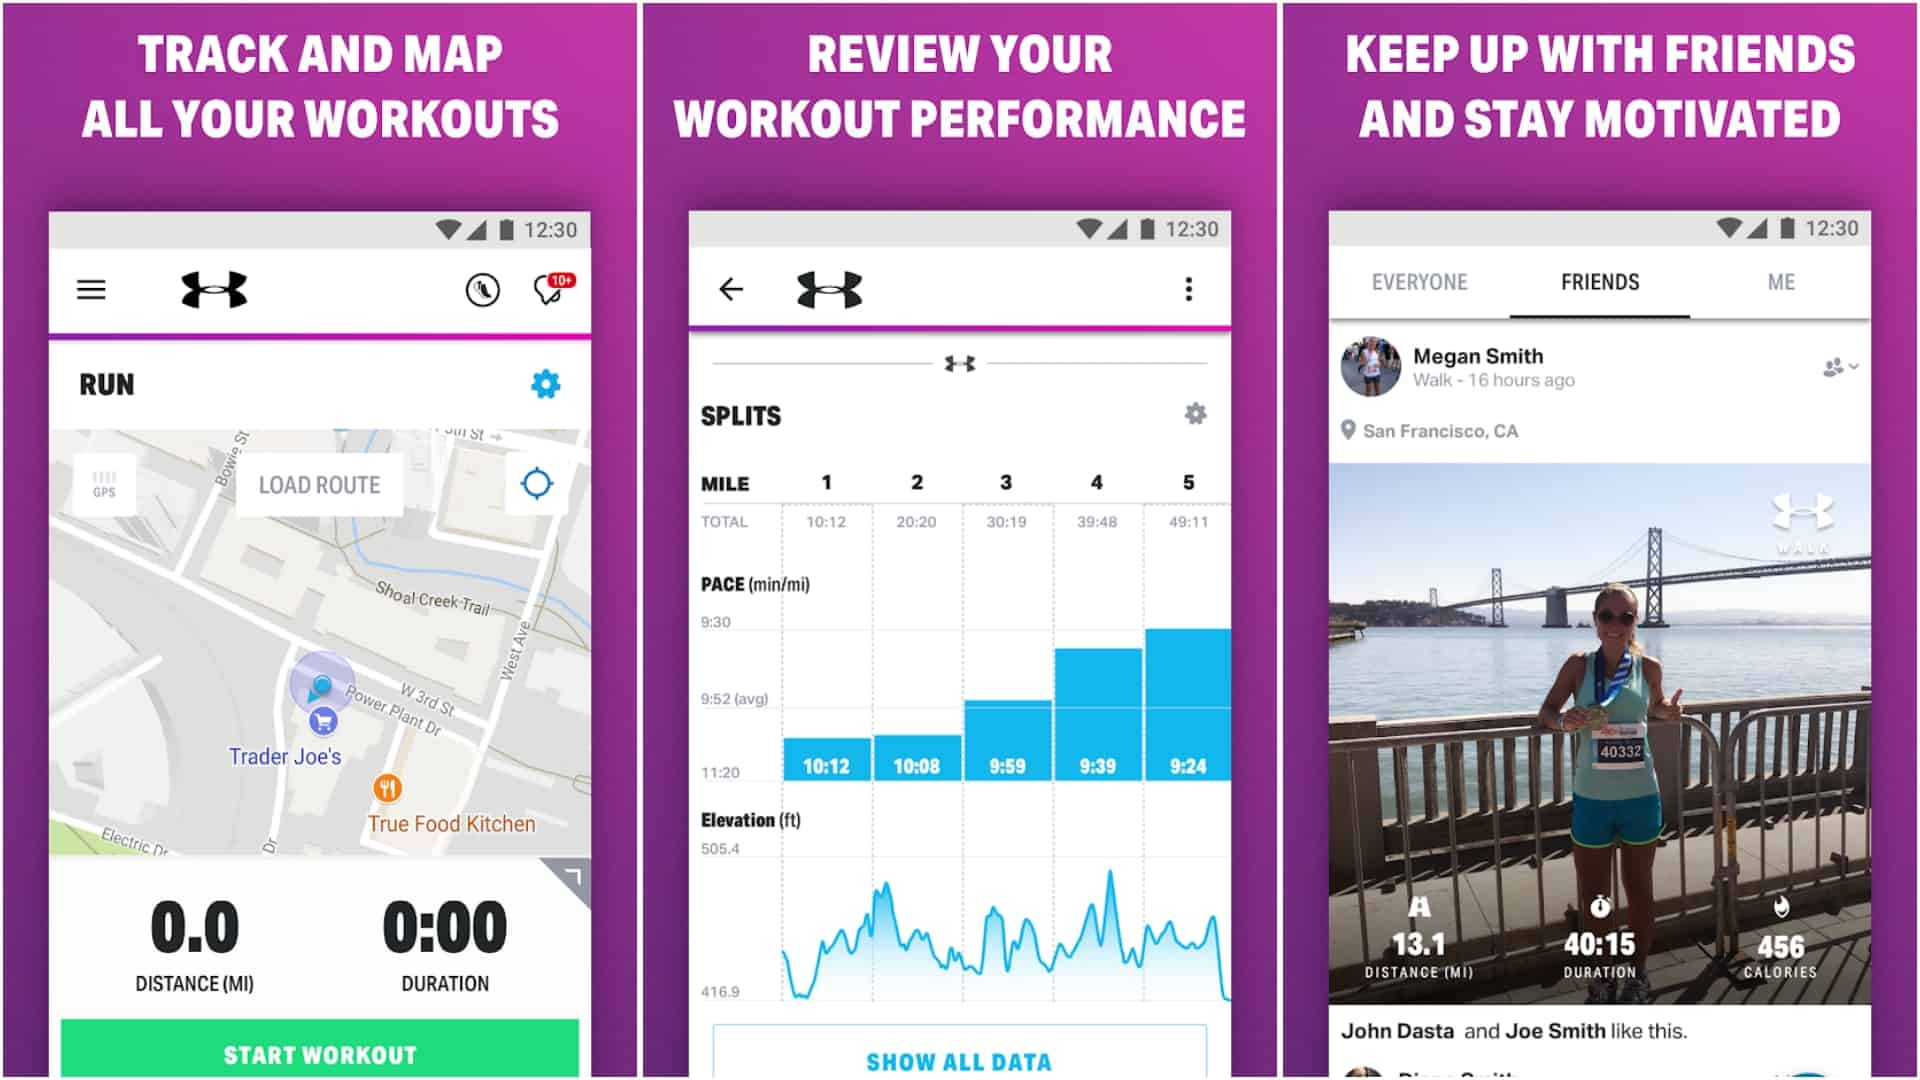 Walk with Map My Walk app image April 2020